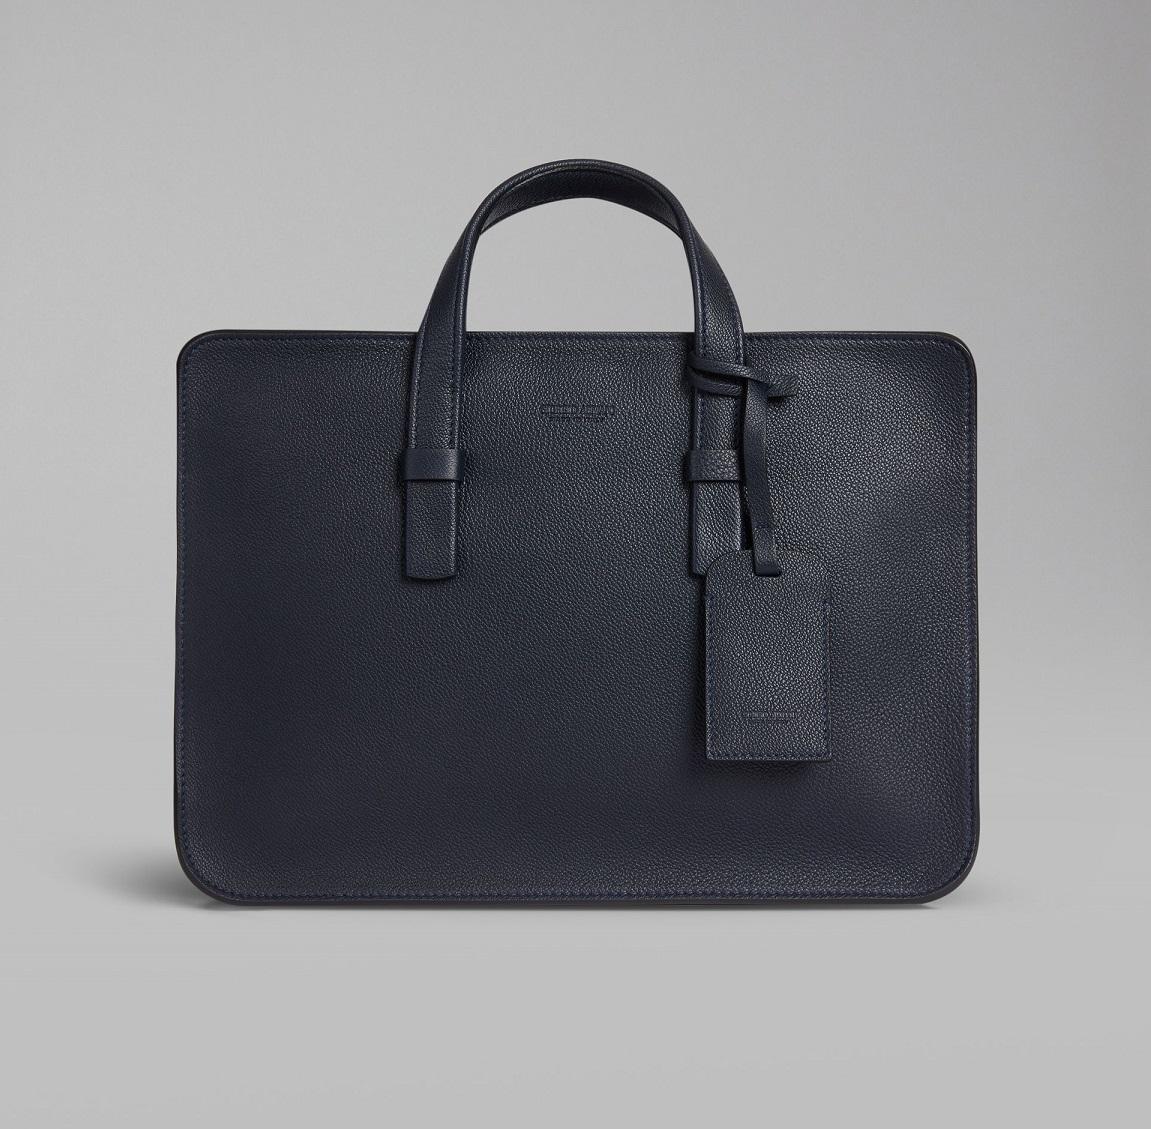 GIORGIO ARMANI(ジョルジオ・アルマーニ) ビジネスバッグ